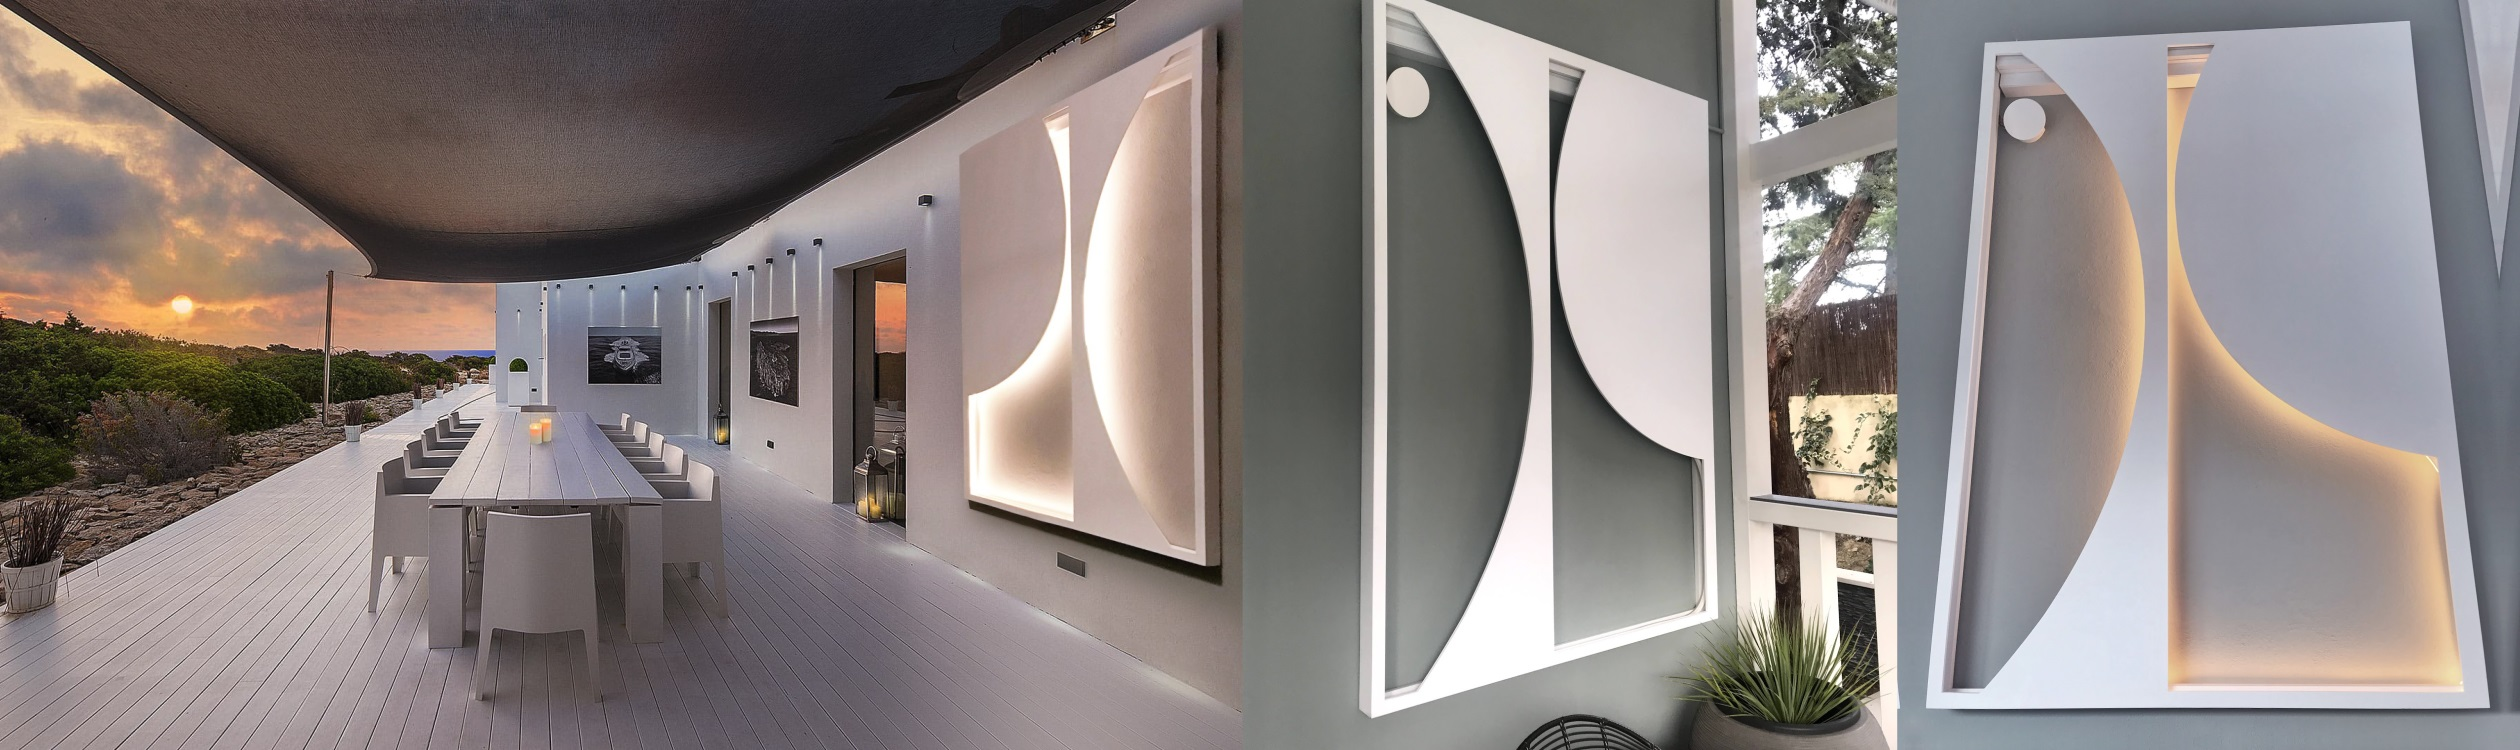 Eclipse lamp ARQ Design Box Exterior Lamp HUE Desktop